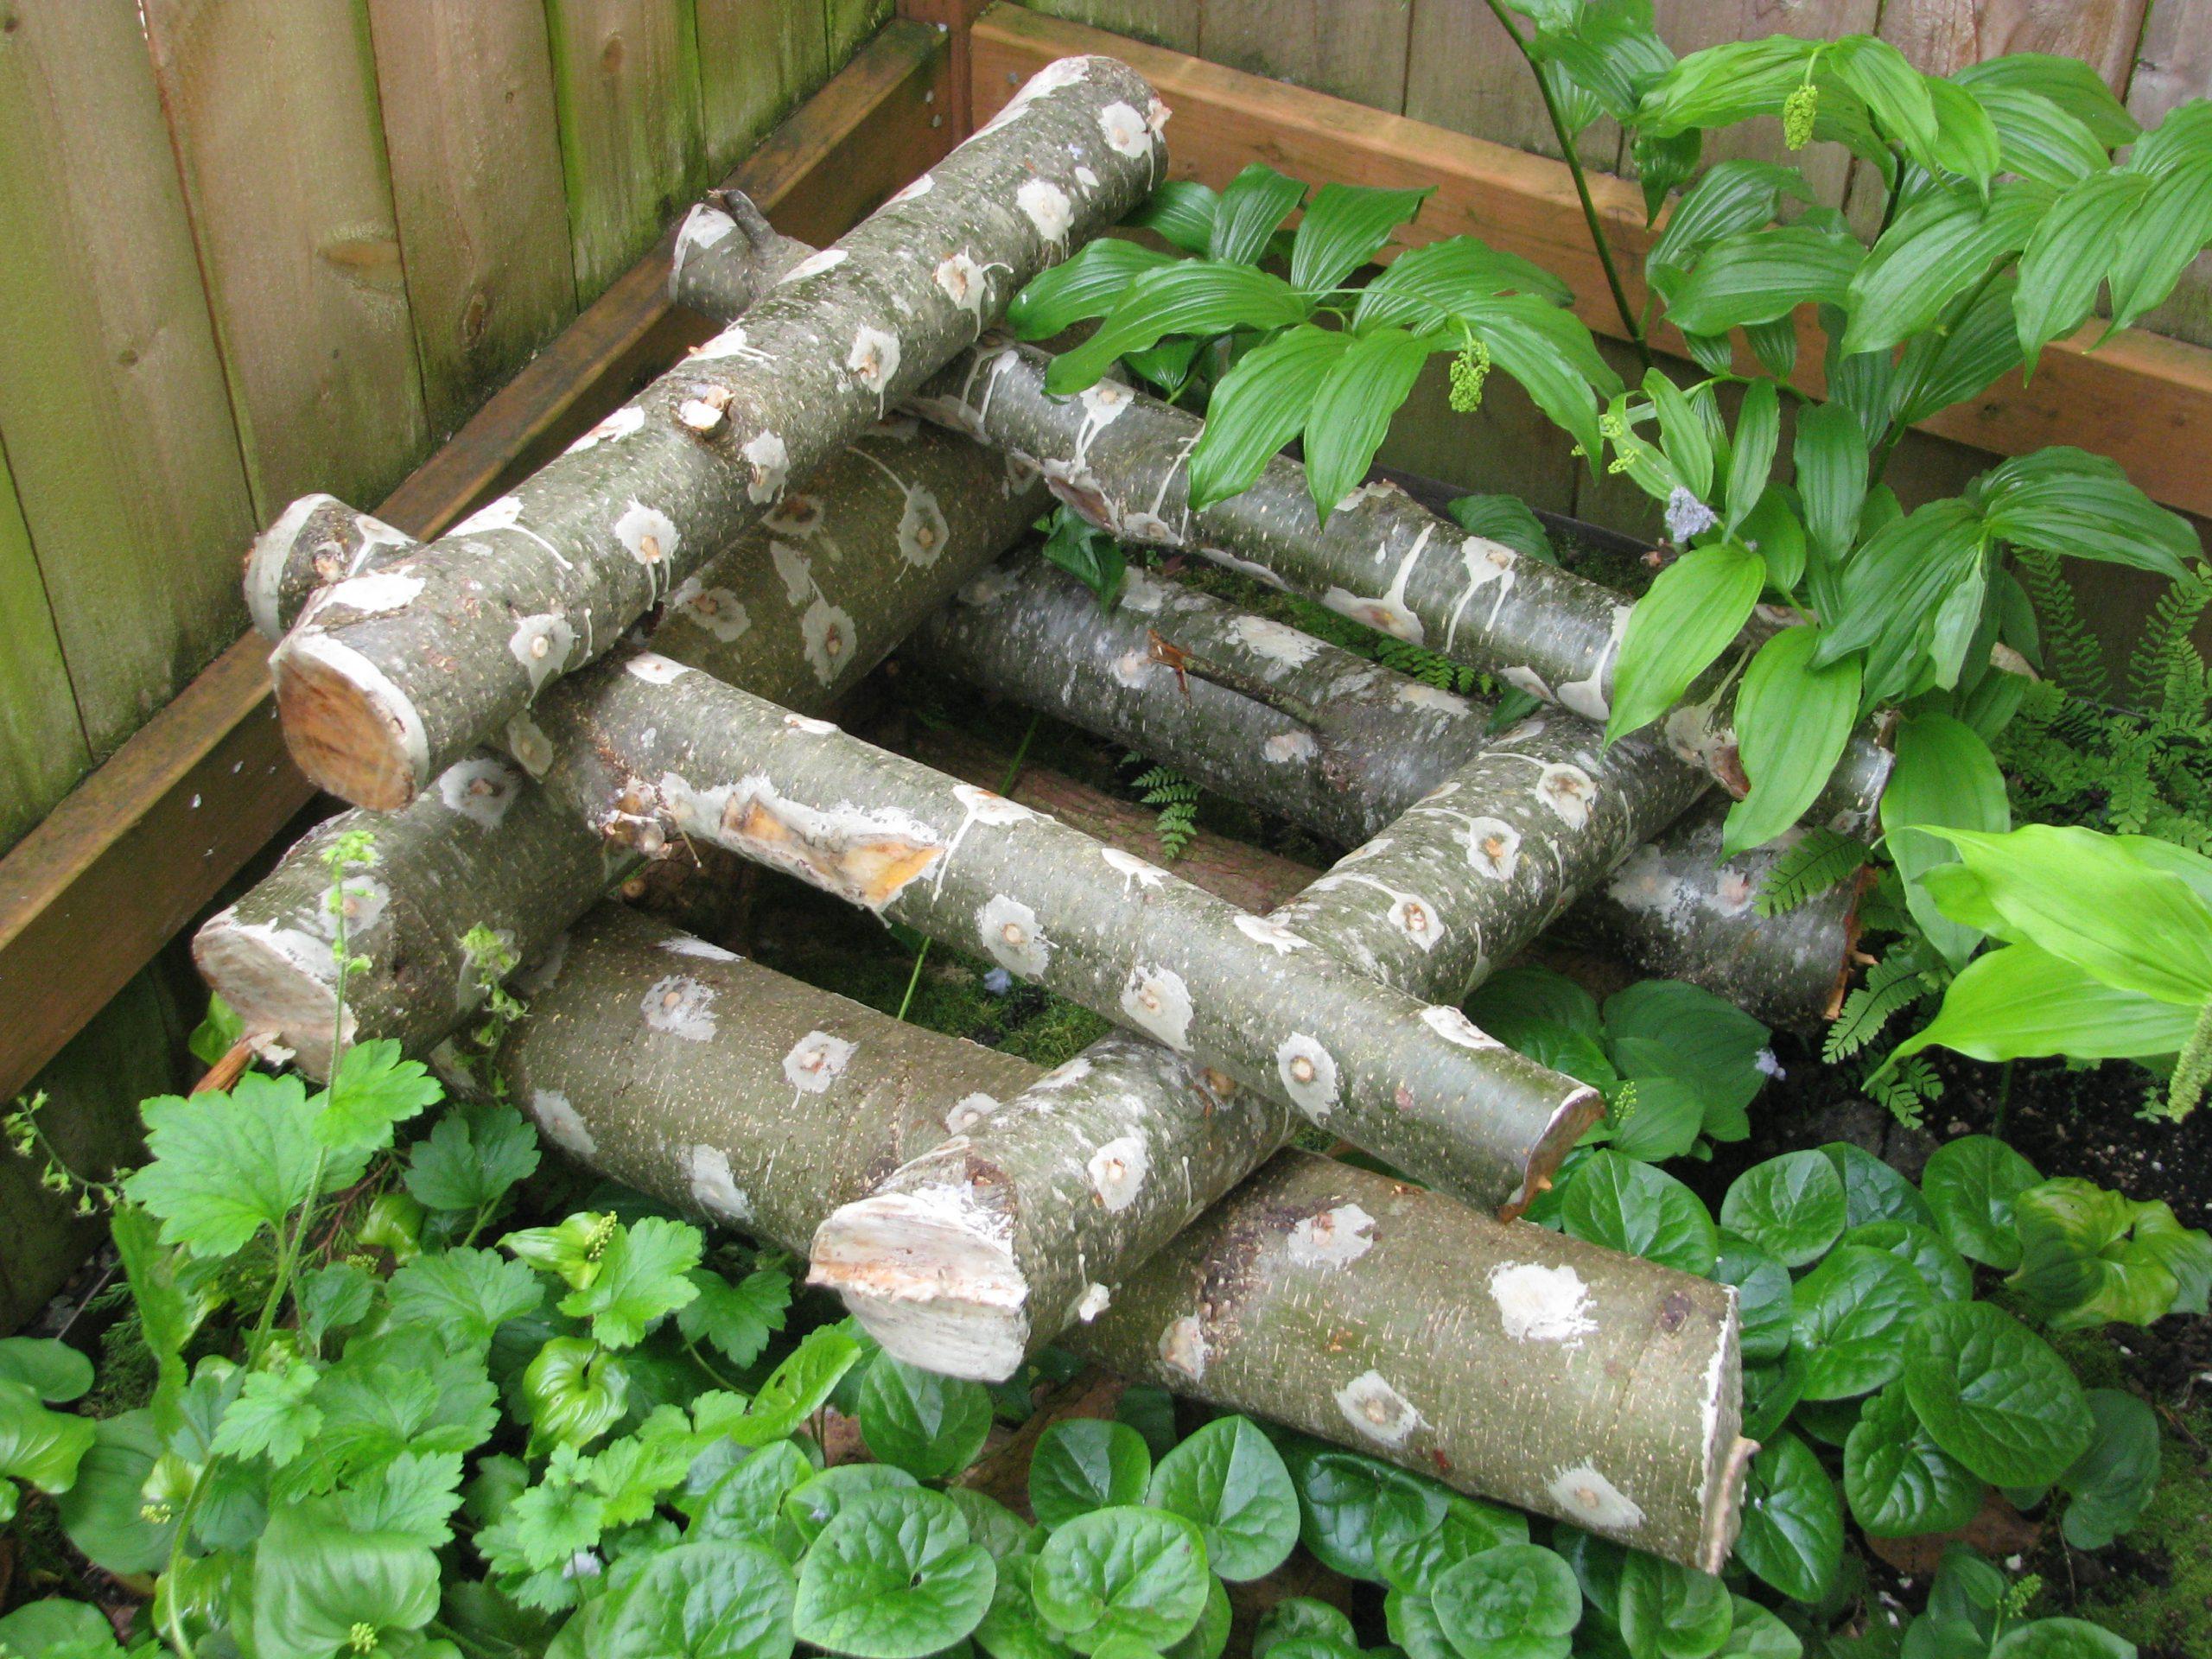 A pile of freshly plugged mushroom growing logs